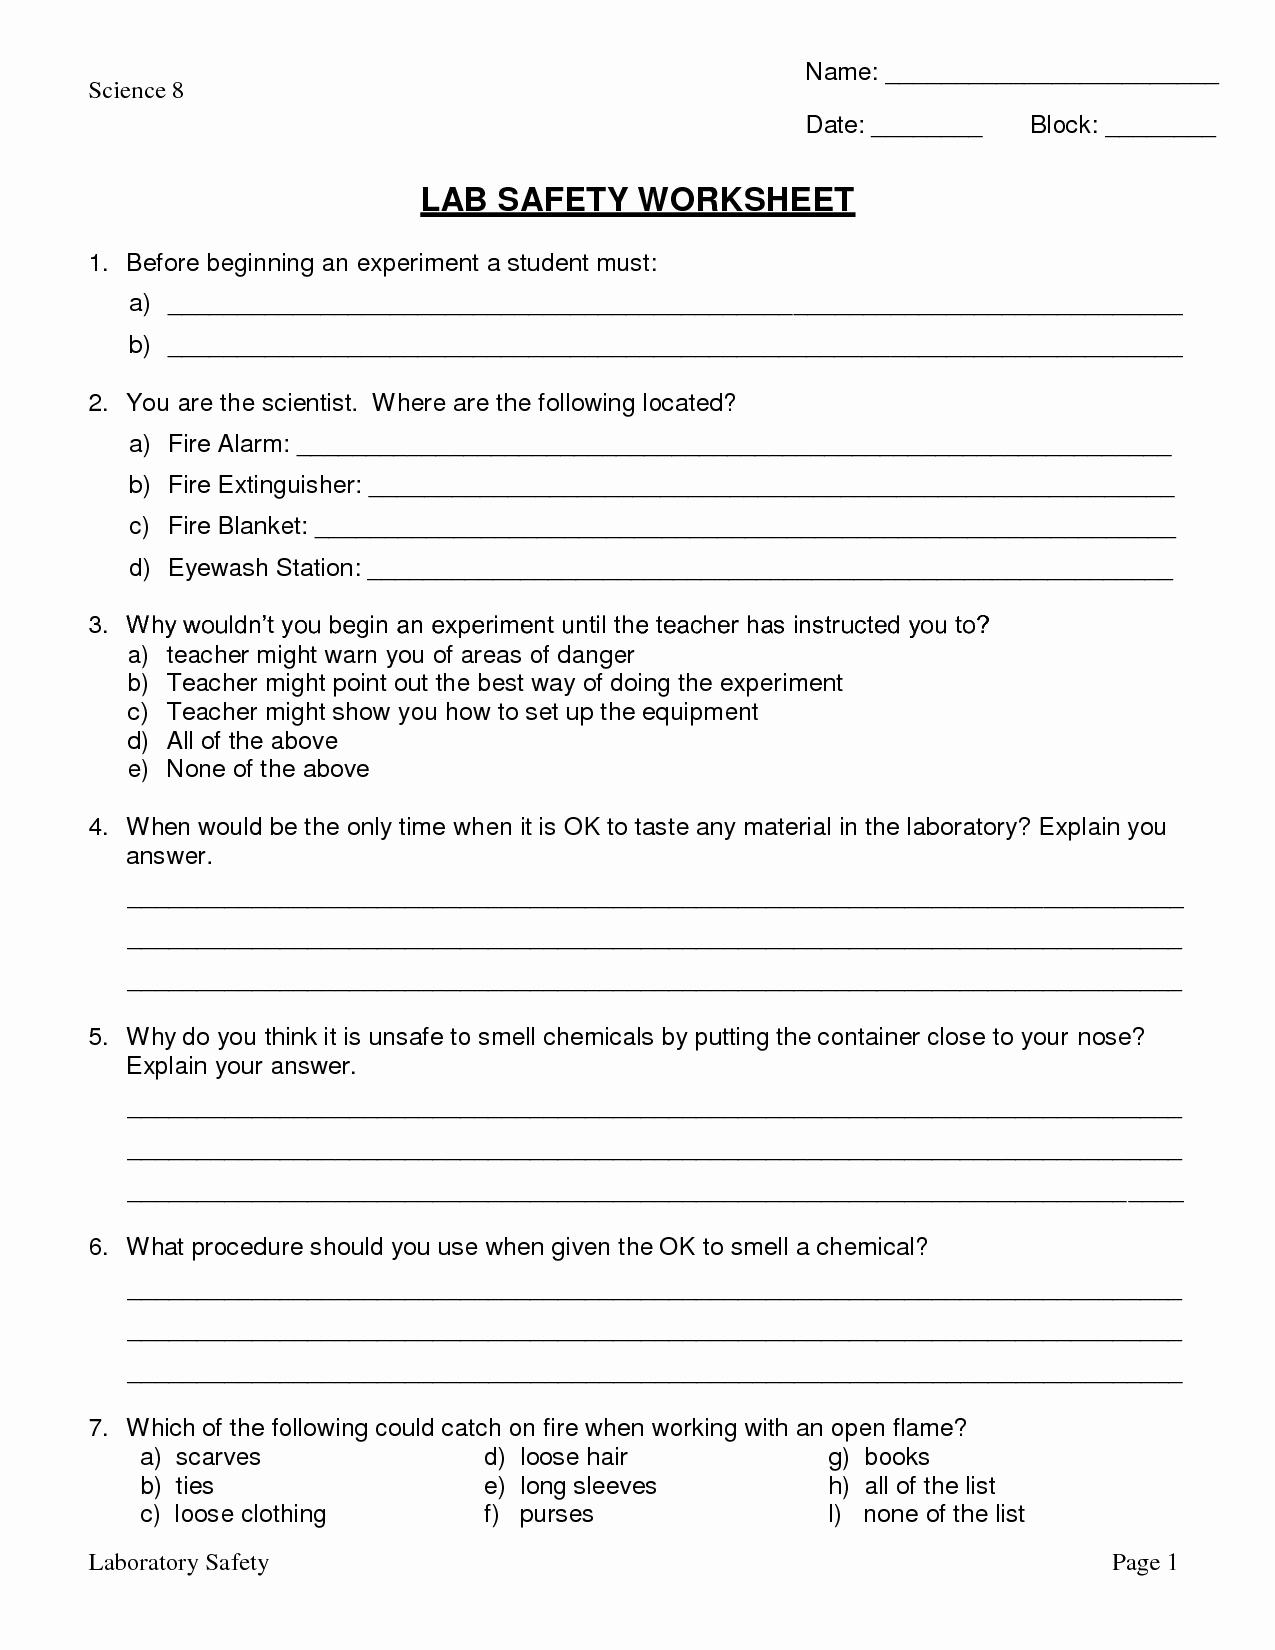 Lab Equipment Worksheet Answer Luxury 11 Best Of Lab Equipment Worksheet Answers